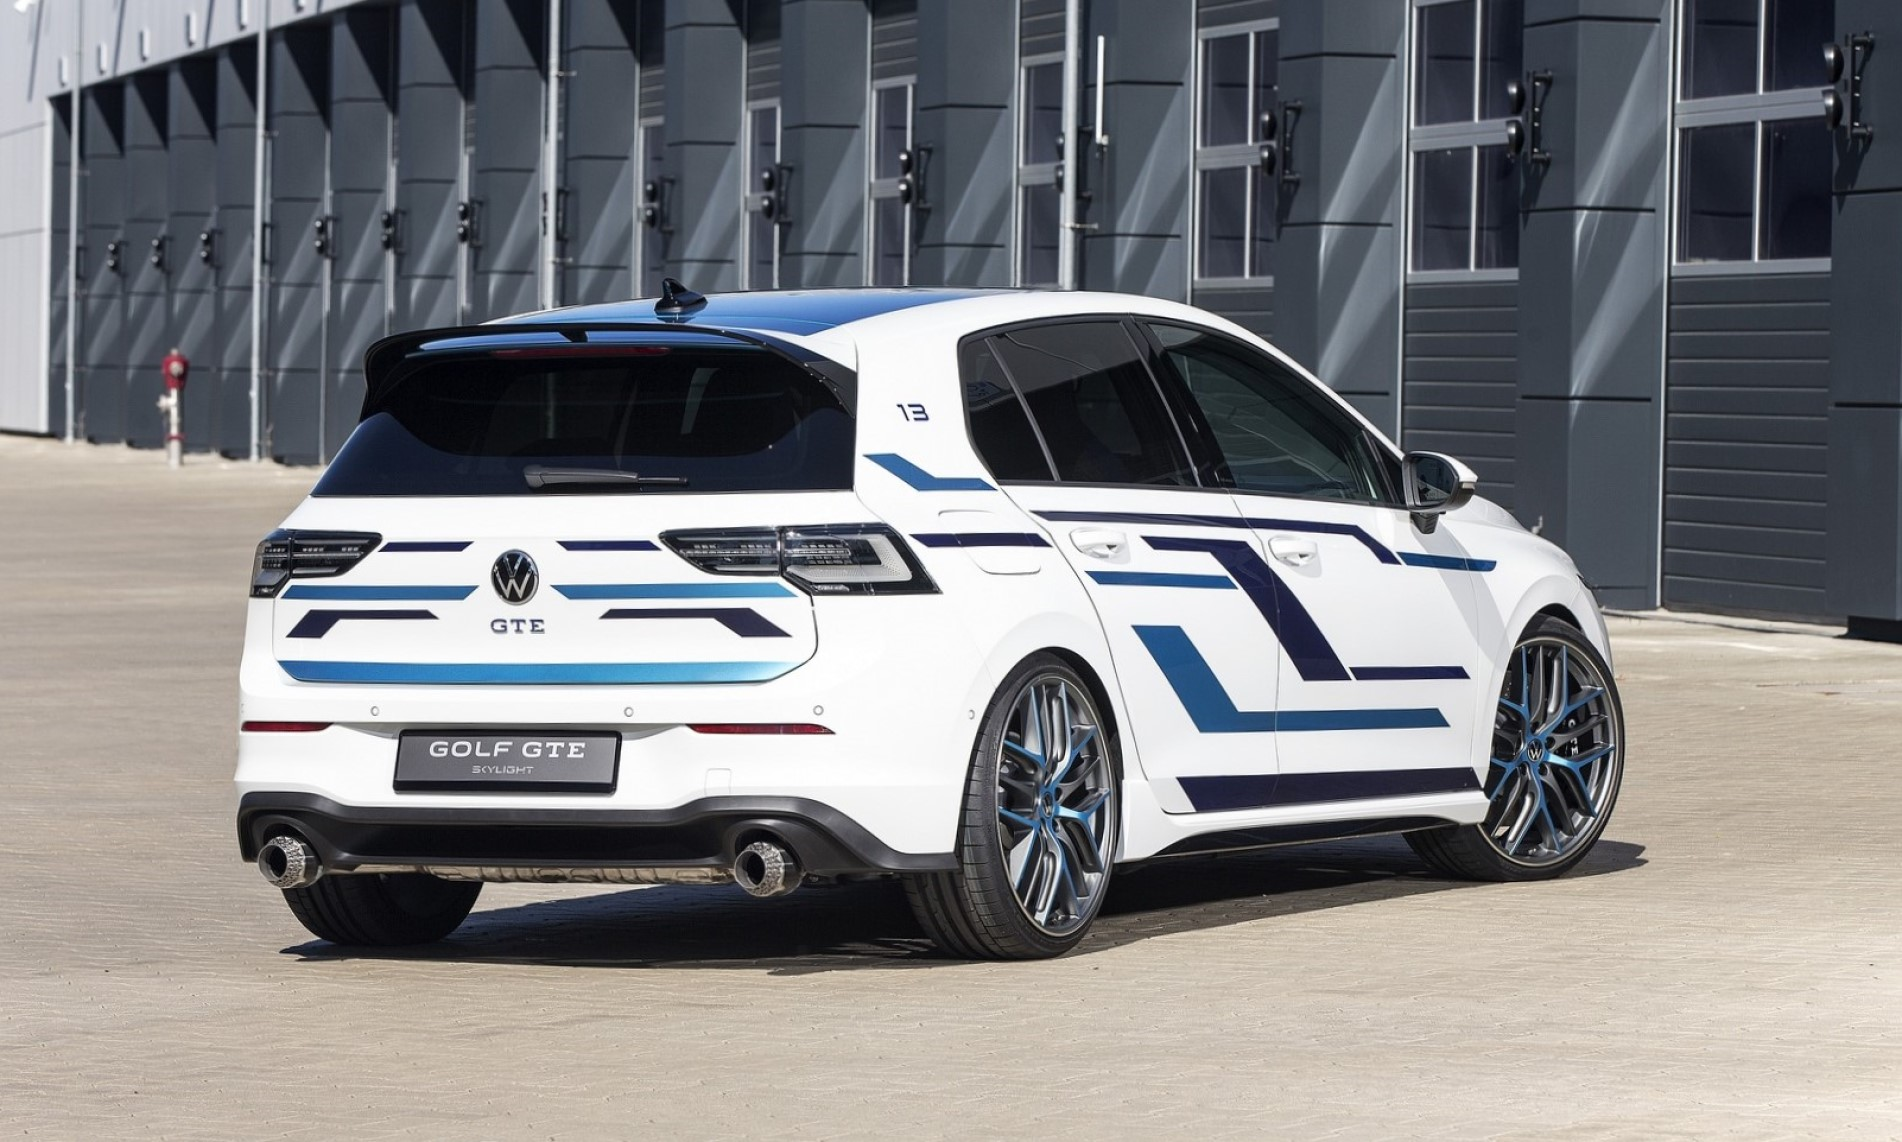 VW Golf GTE Skylight rear